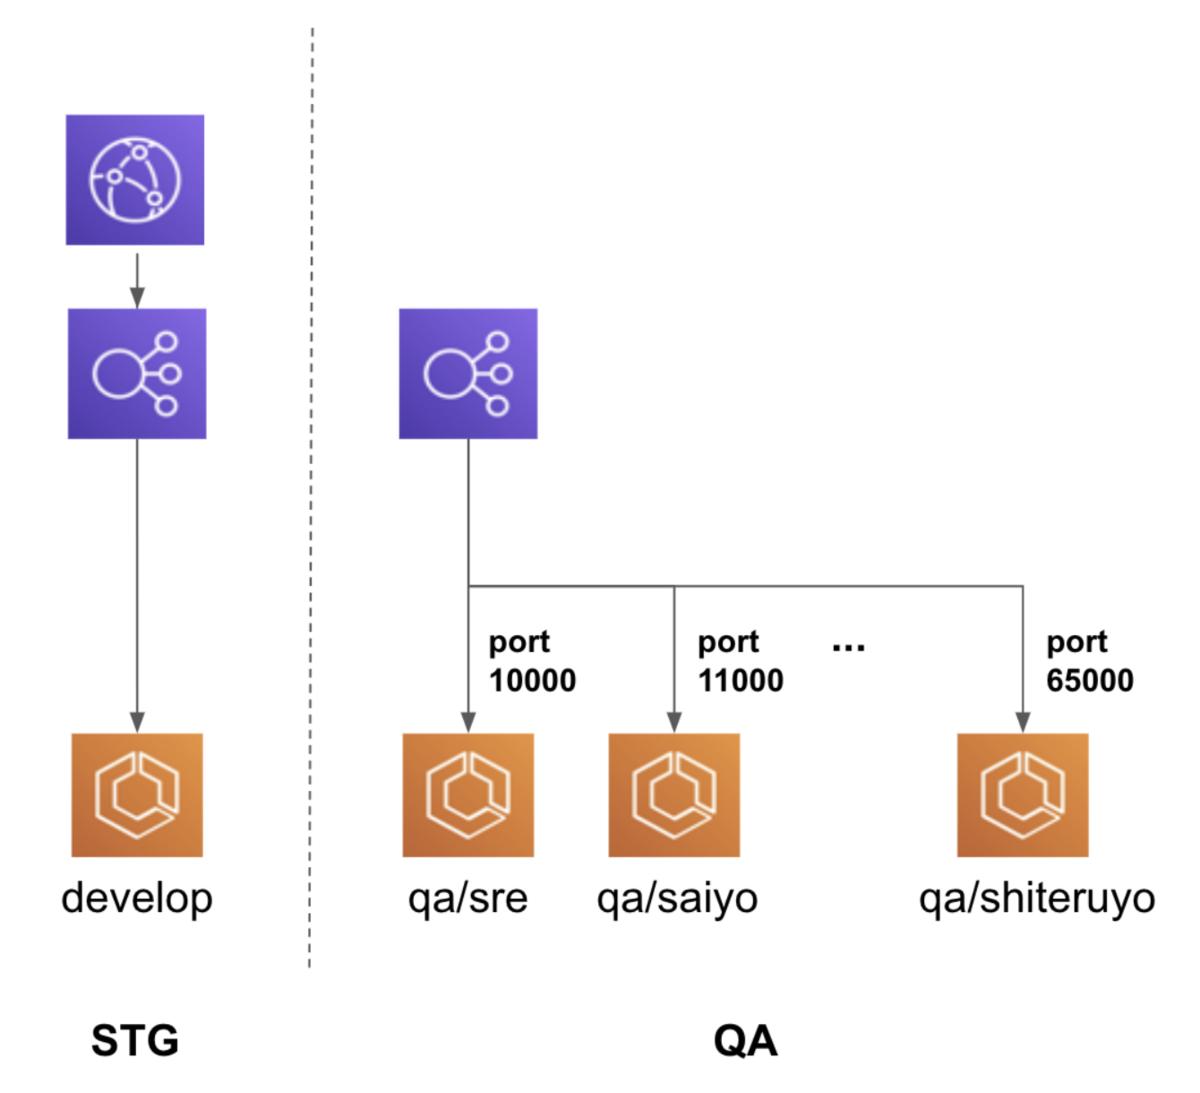 CloudFront の機能を前提とした機能の検証は QA 環境ではしない